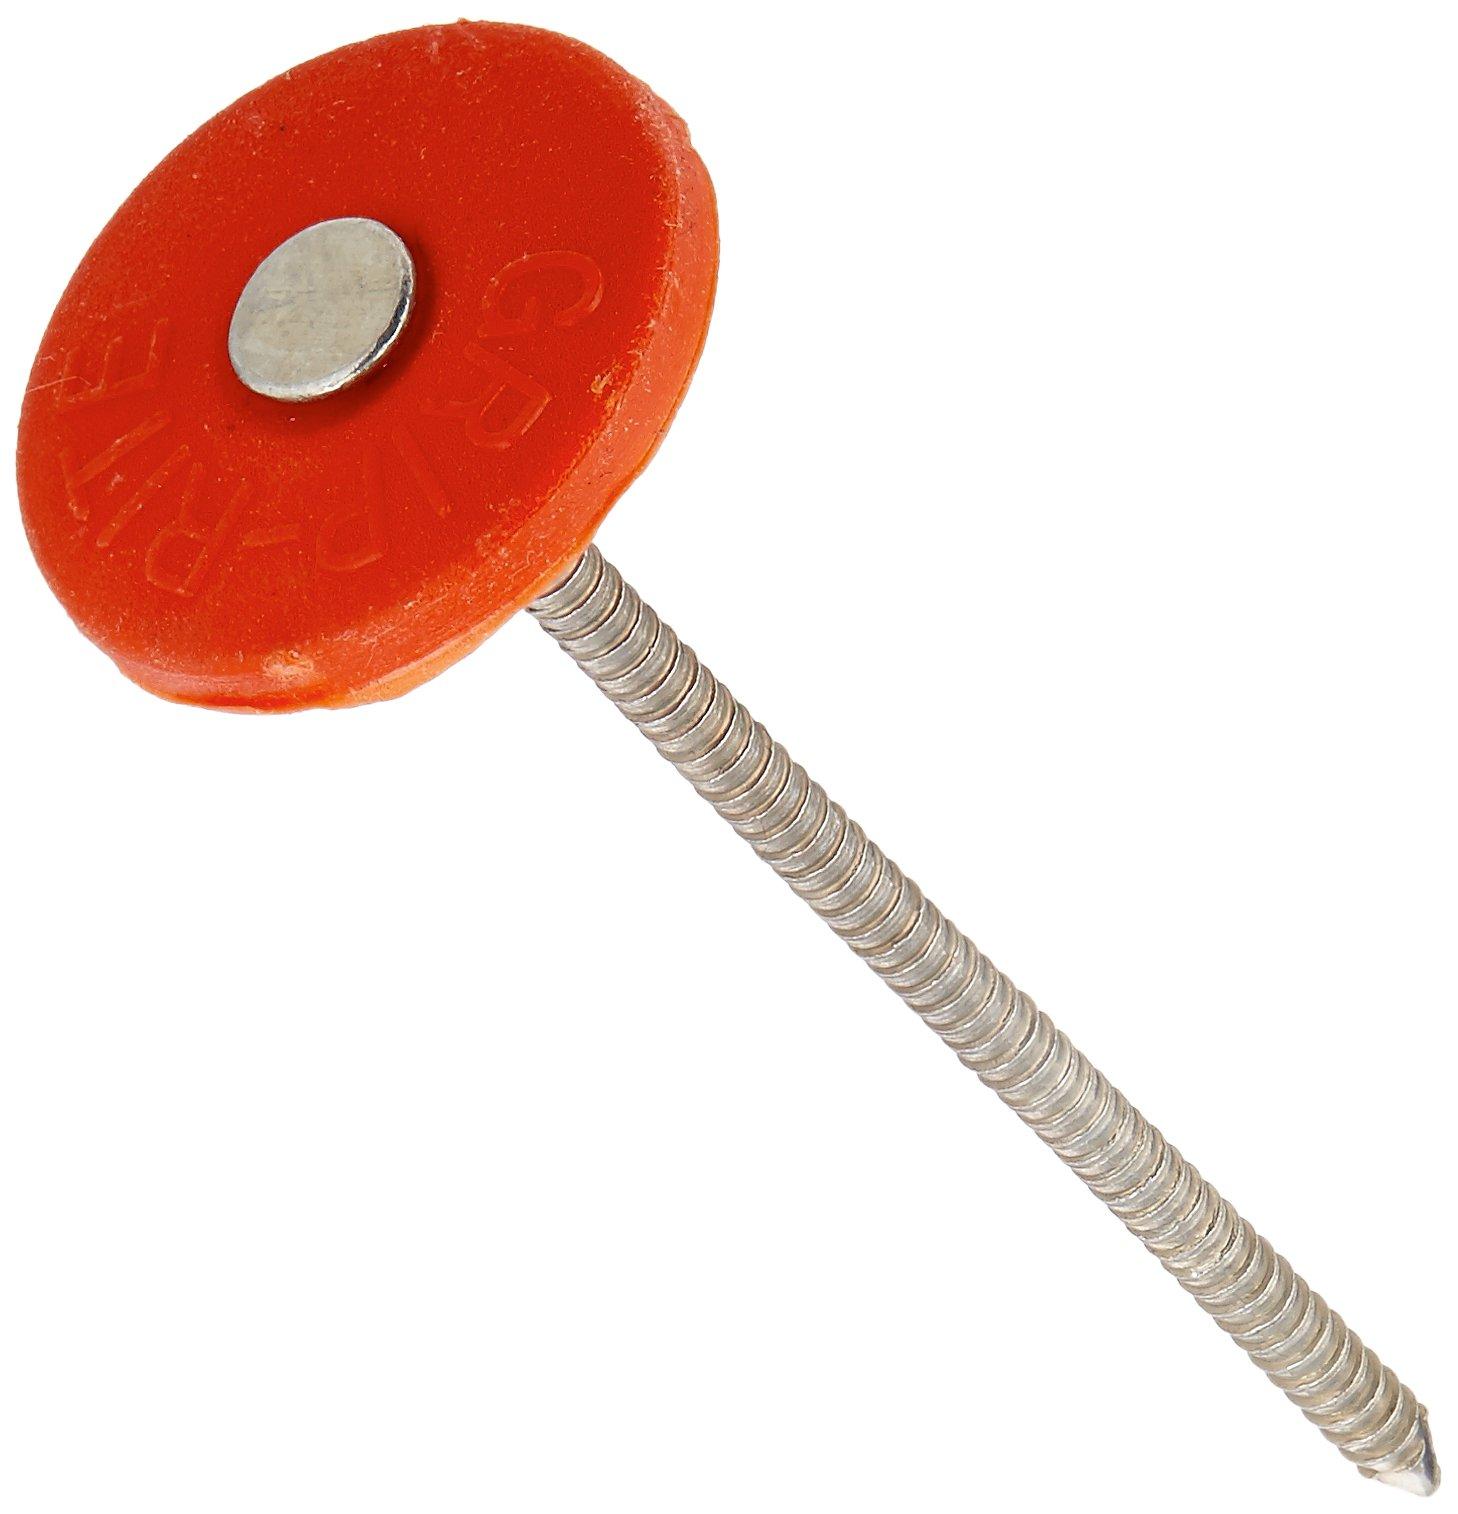 Grip Rite 3PRCAP1 1.150 lb Electro Galvanized Round Plastic Grip-Cap Nail, 3'' by Grip-Rite